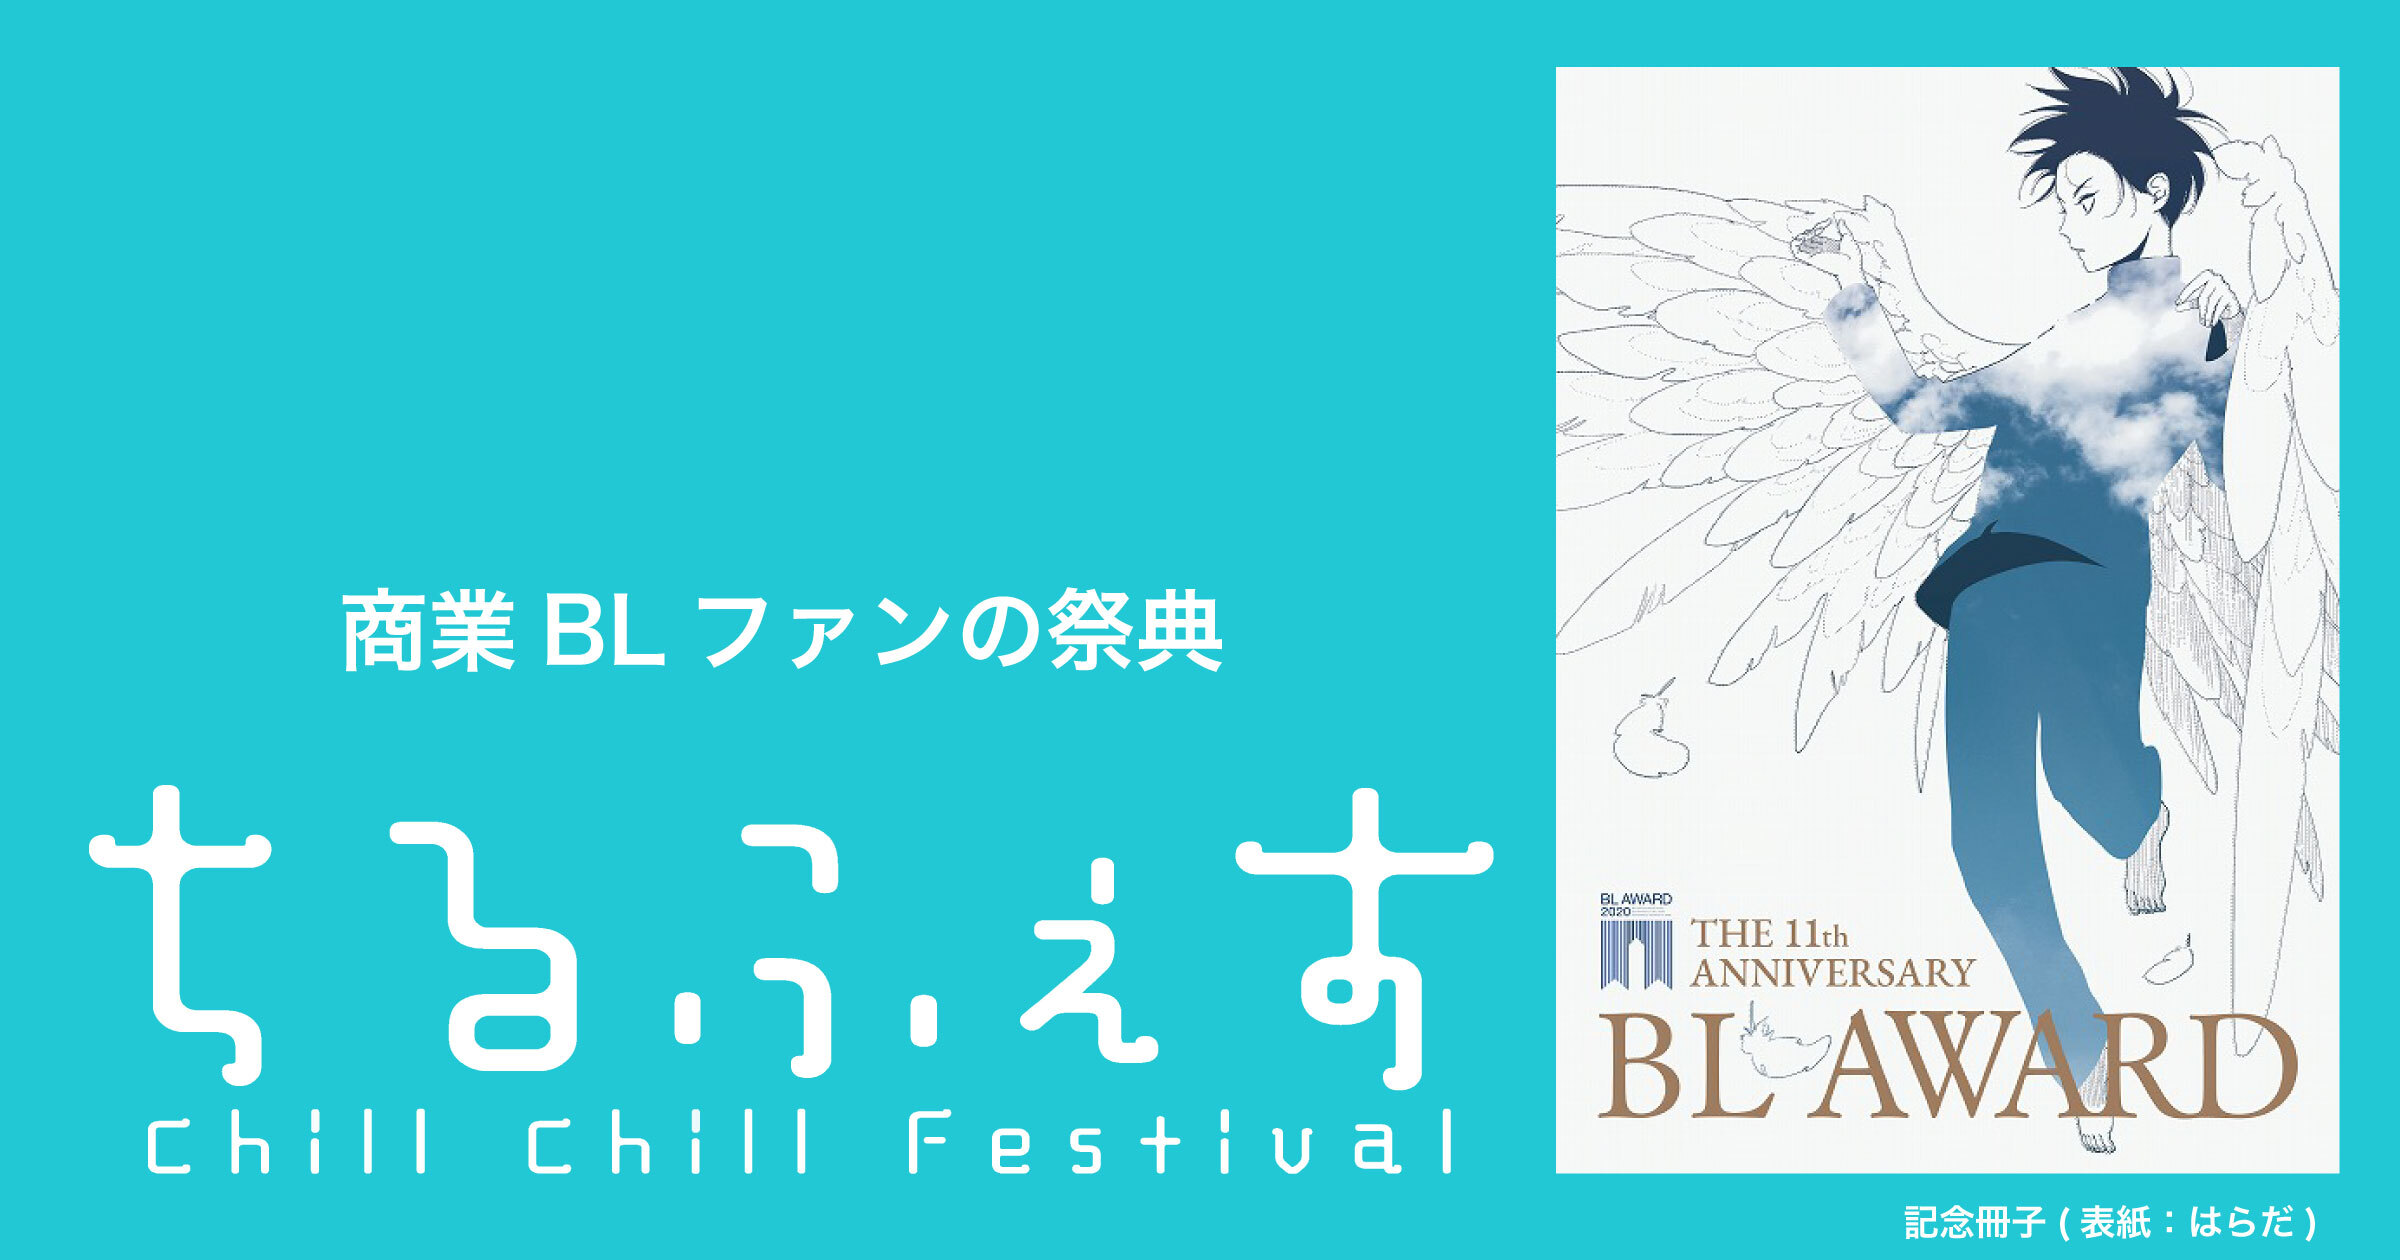 【CHILL CHILL FESTIVAL 3rd】7月19日サイン本販売抽選整理券